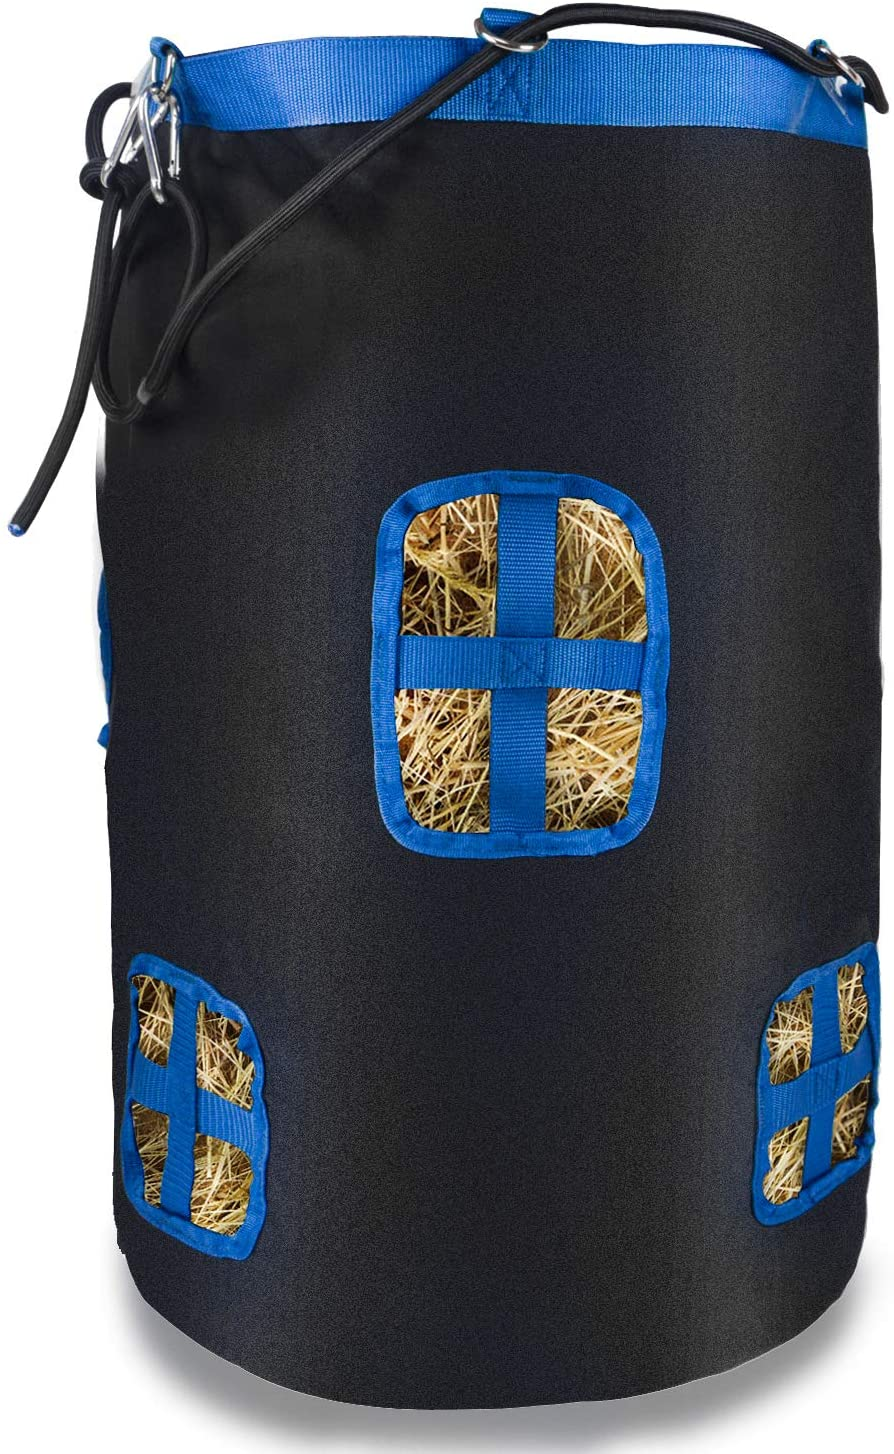 Yuar butee Round Hay Bag Hay Bale Storage Bag,Large Tote Hay Bale Carry Bag